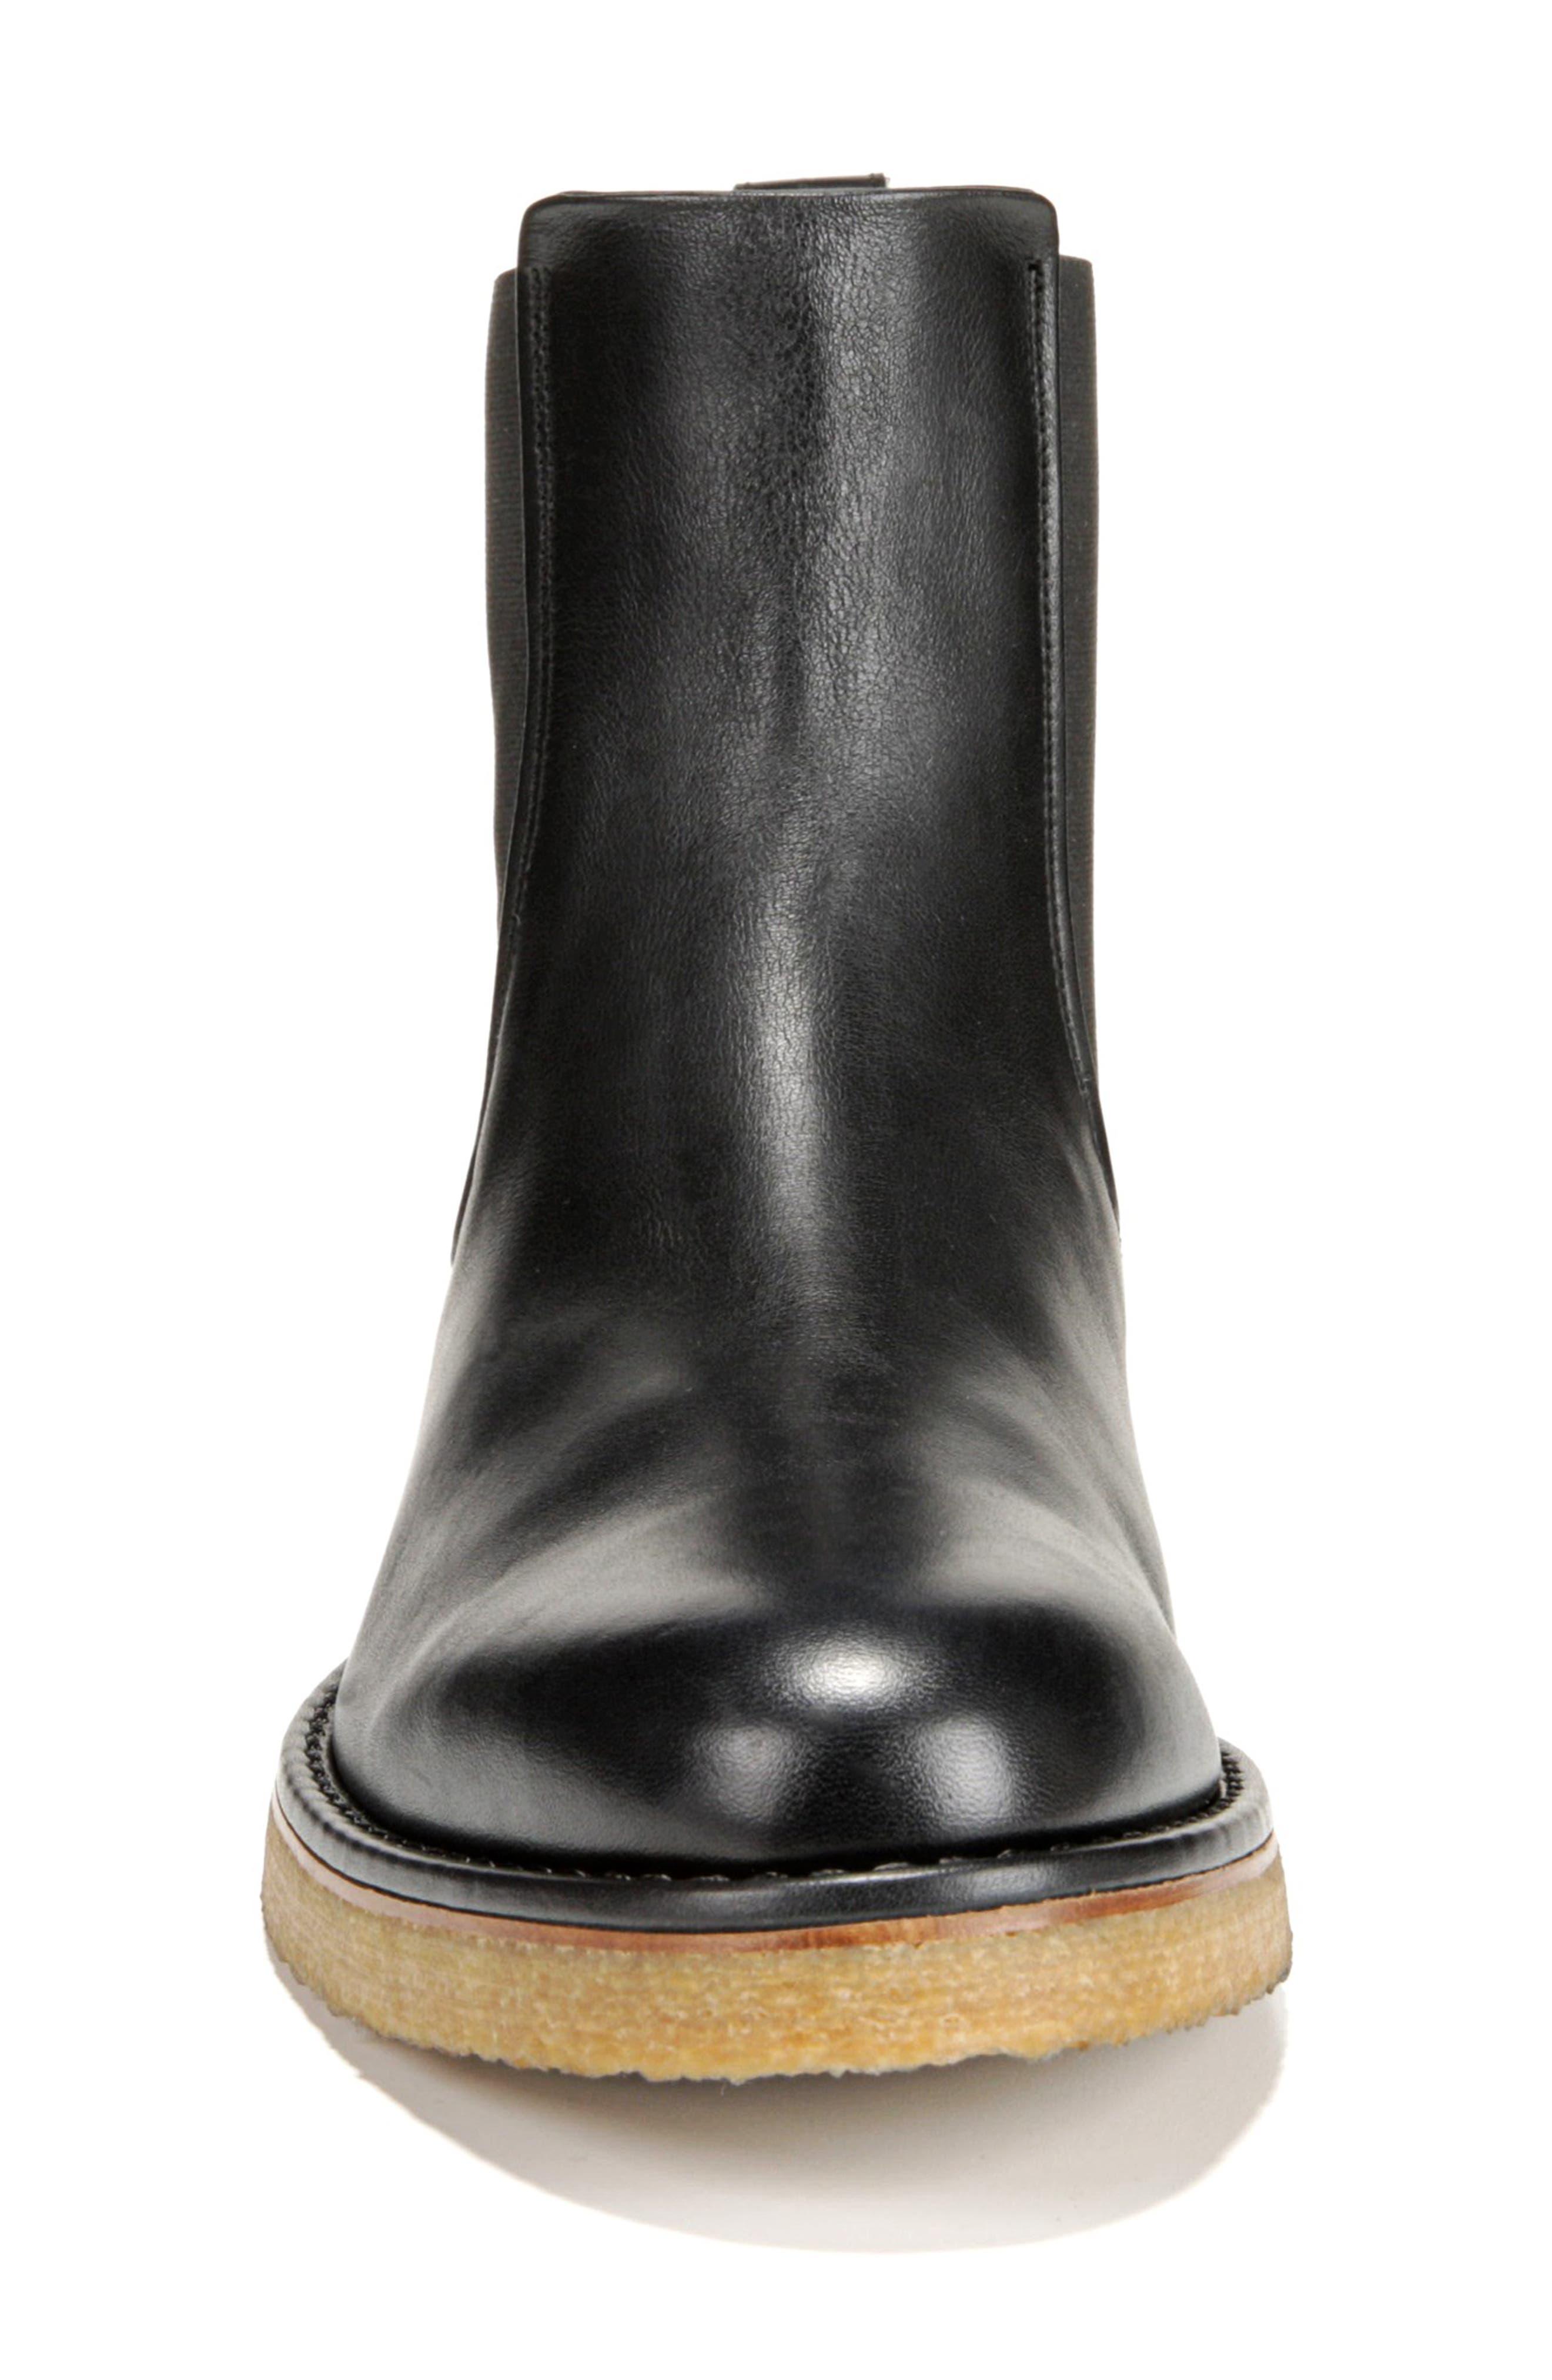 Cresslor Chelsea Boot,                             Alternate thumbnail 4, color,                             BLACK